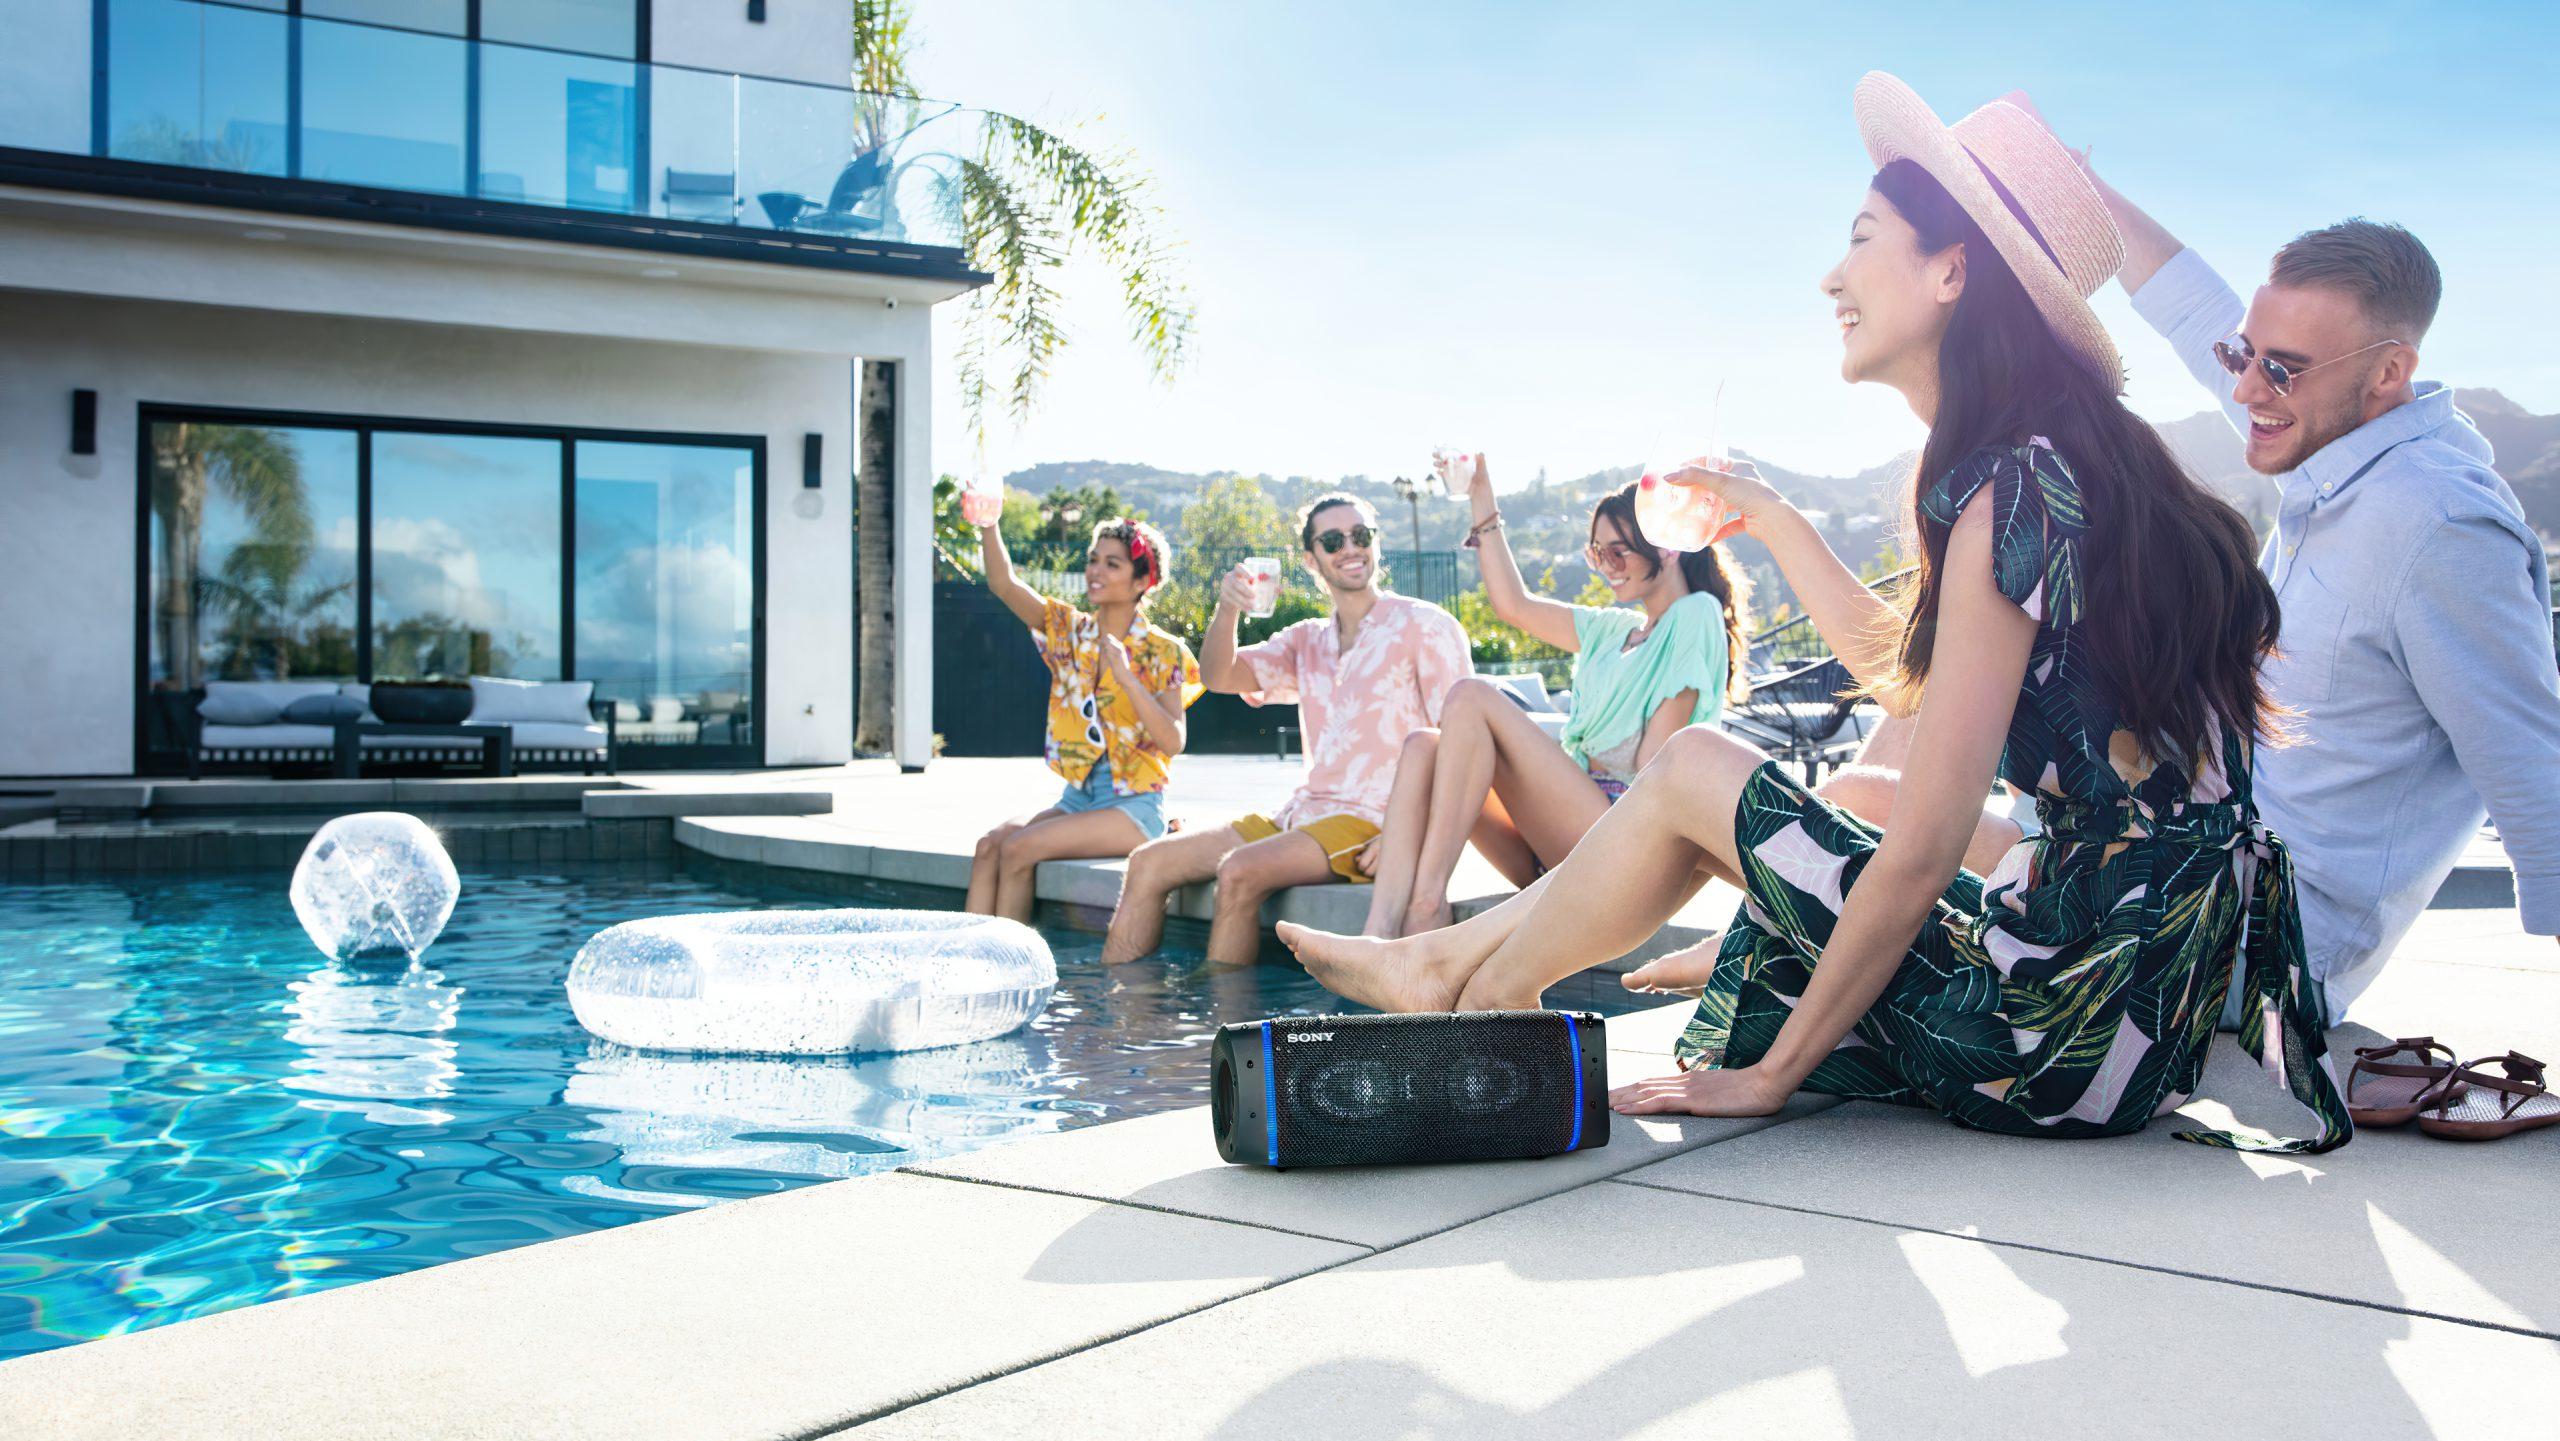 Sony SRS-XB33 har overraskende potent lyd til størrelsen. Foto: Sony